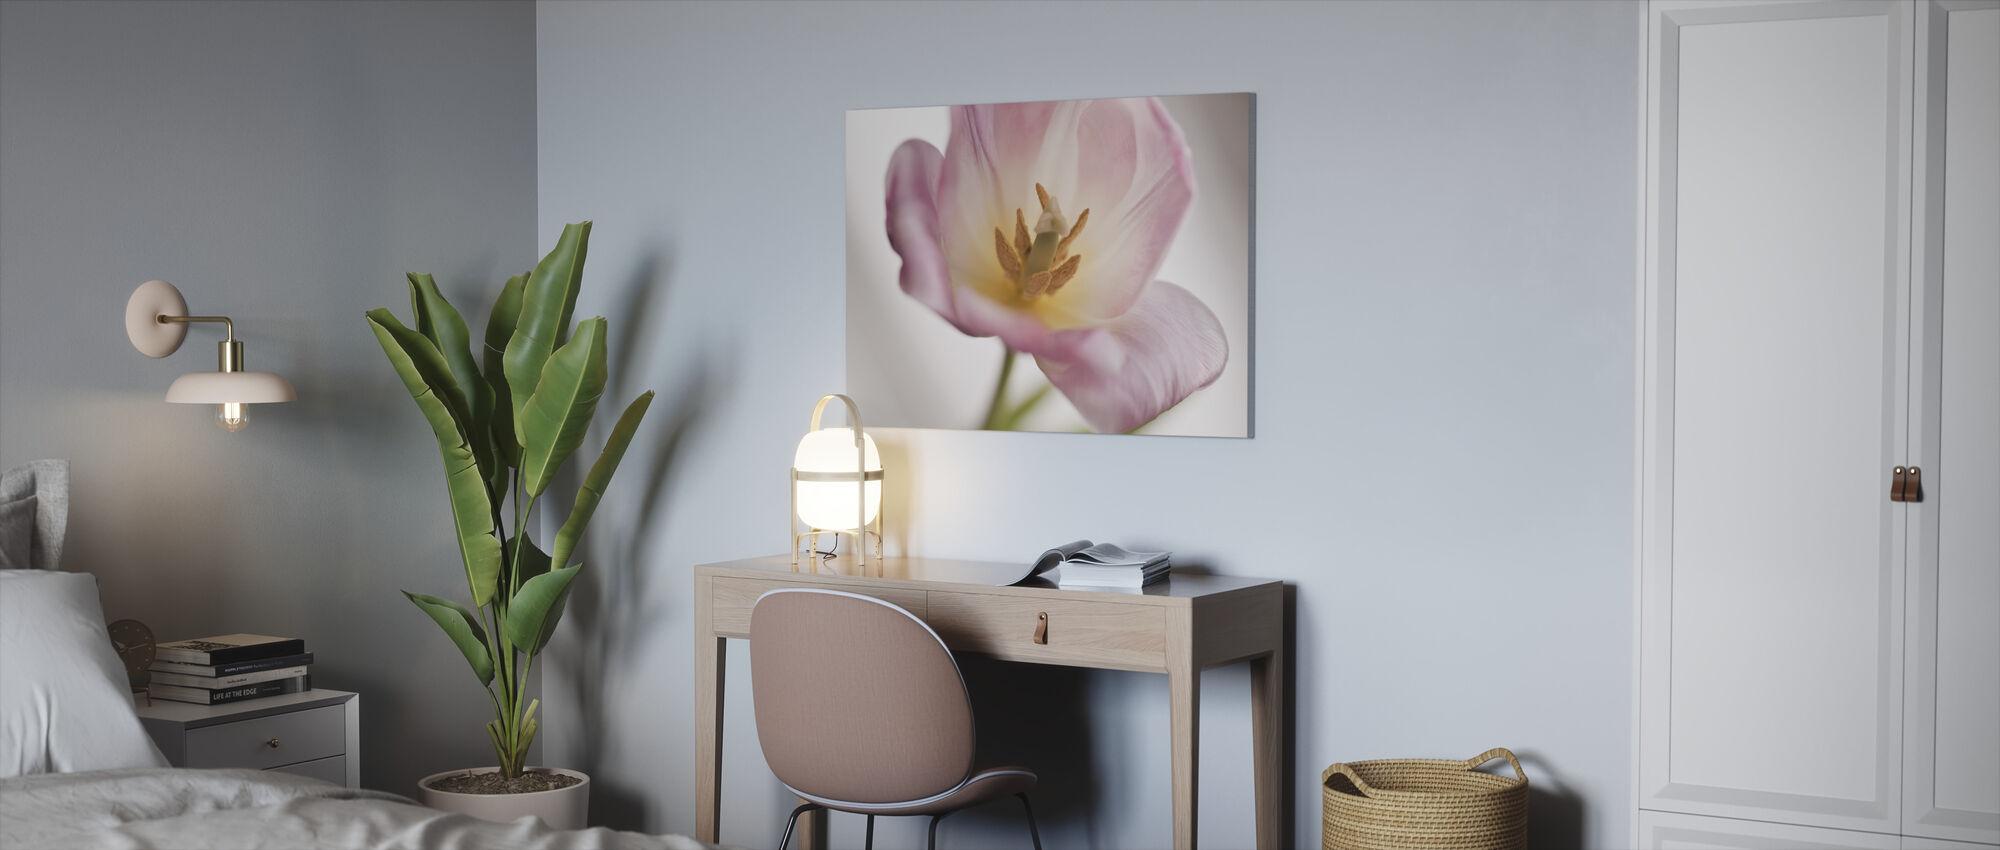 Tulip - Canvas print - Office